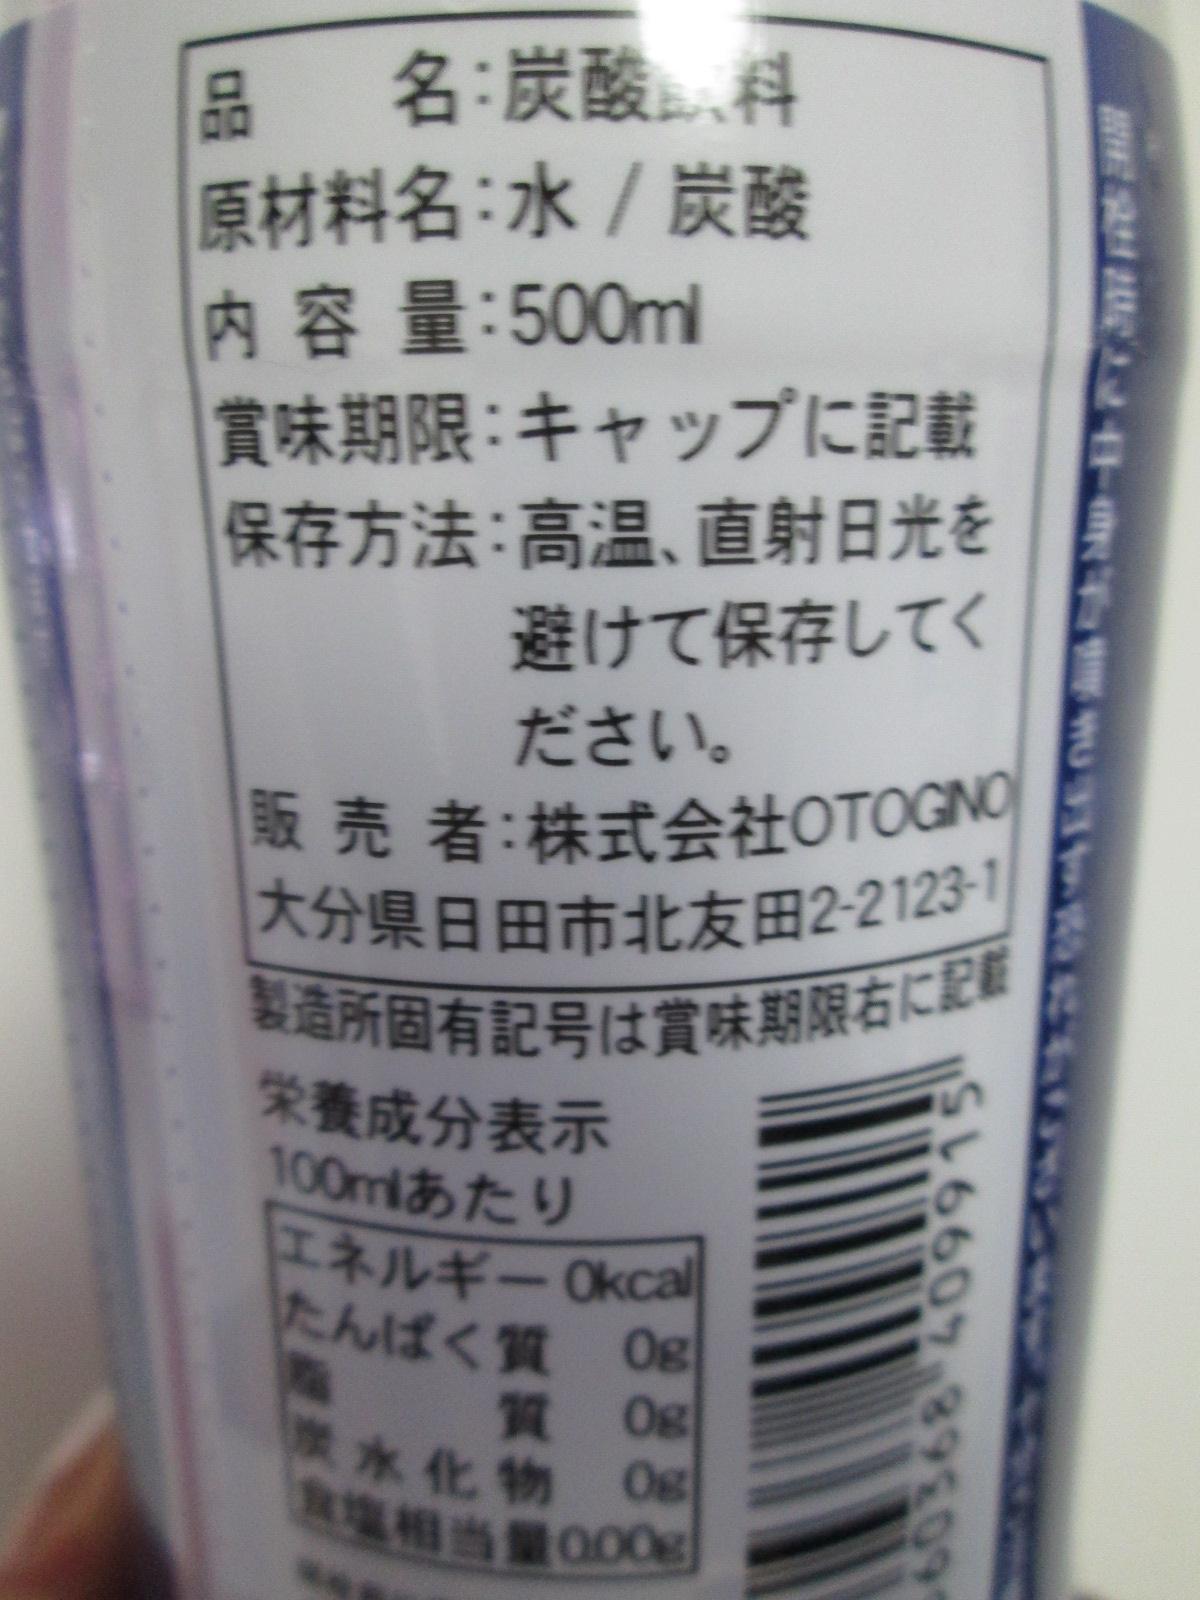 IMG_7618 クオス 炭酸水 (4)